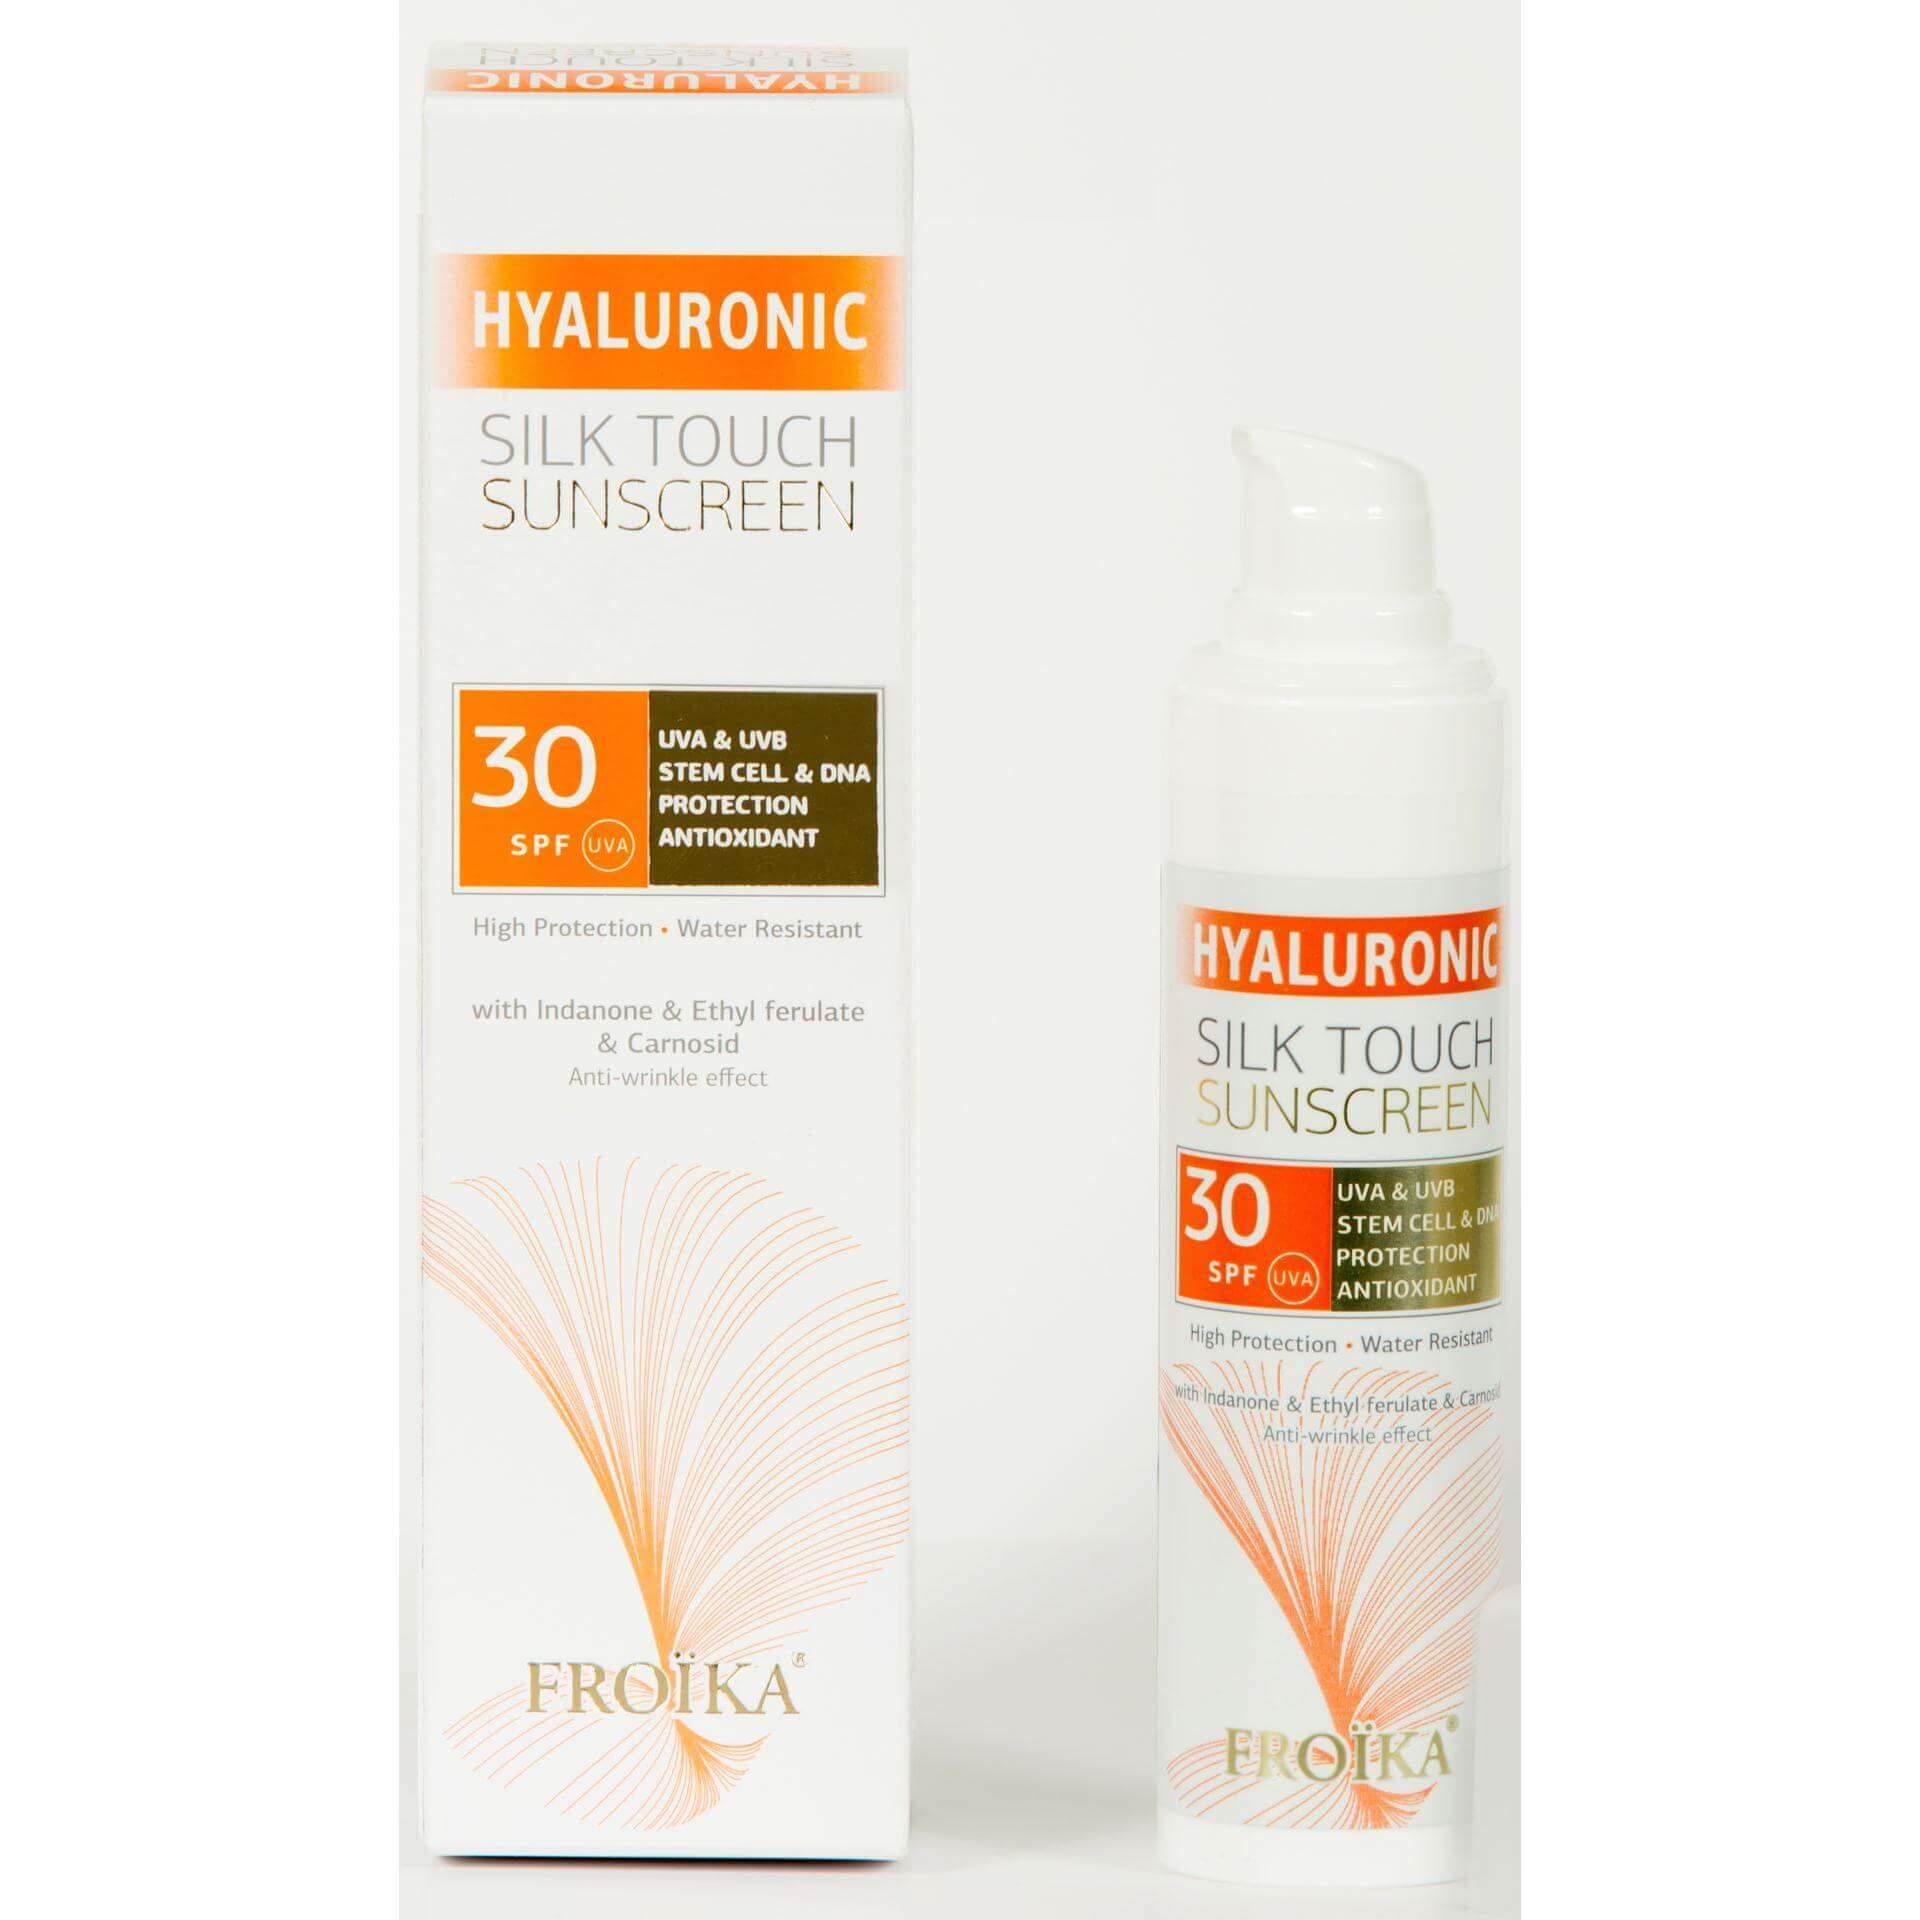 Froika Hyaluronic Silk Touch Suncare Cream SPF30 Με Αντιρυτιδικούς Παράγοντες 40ml